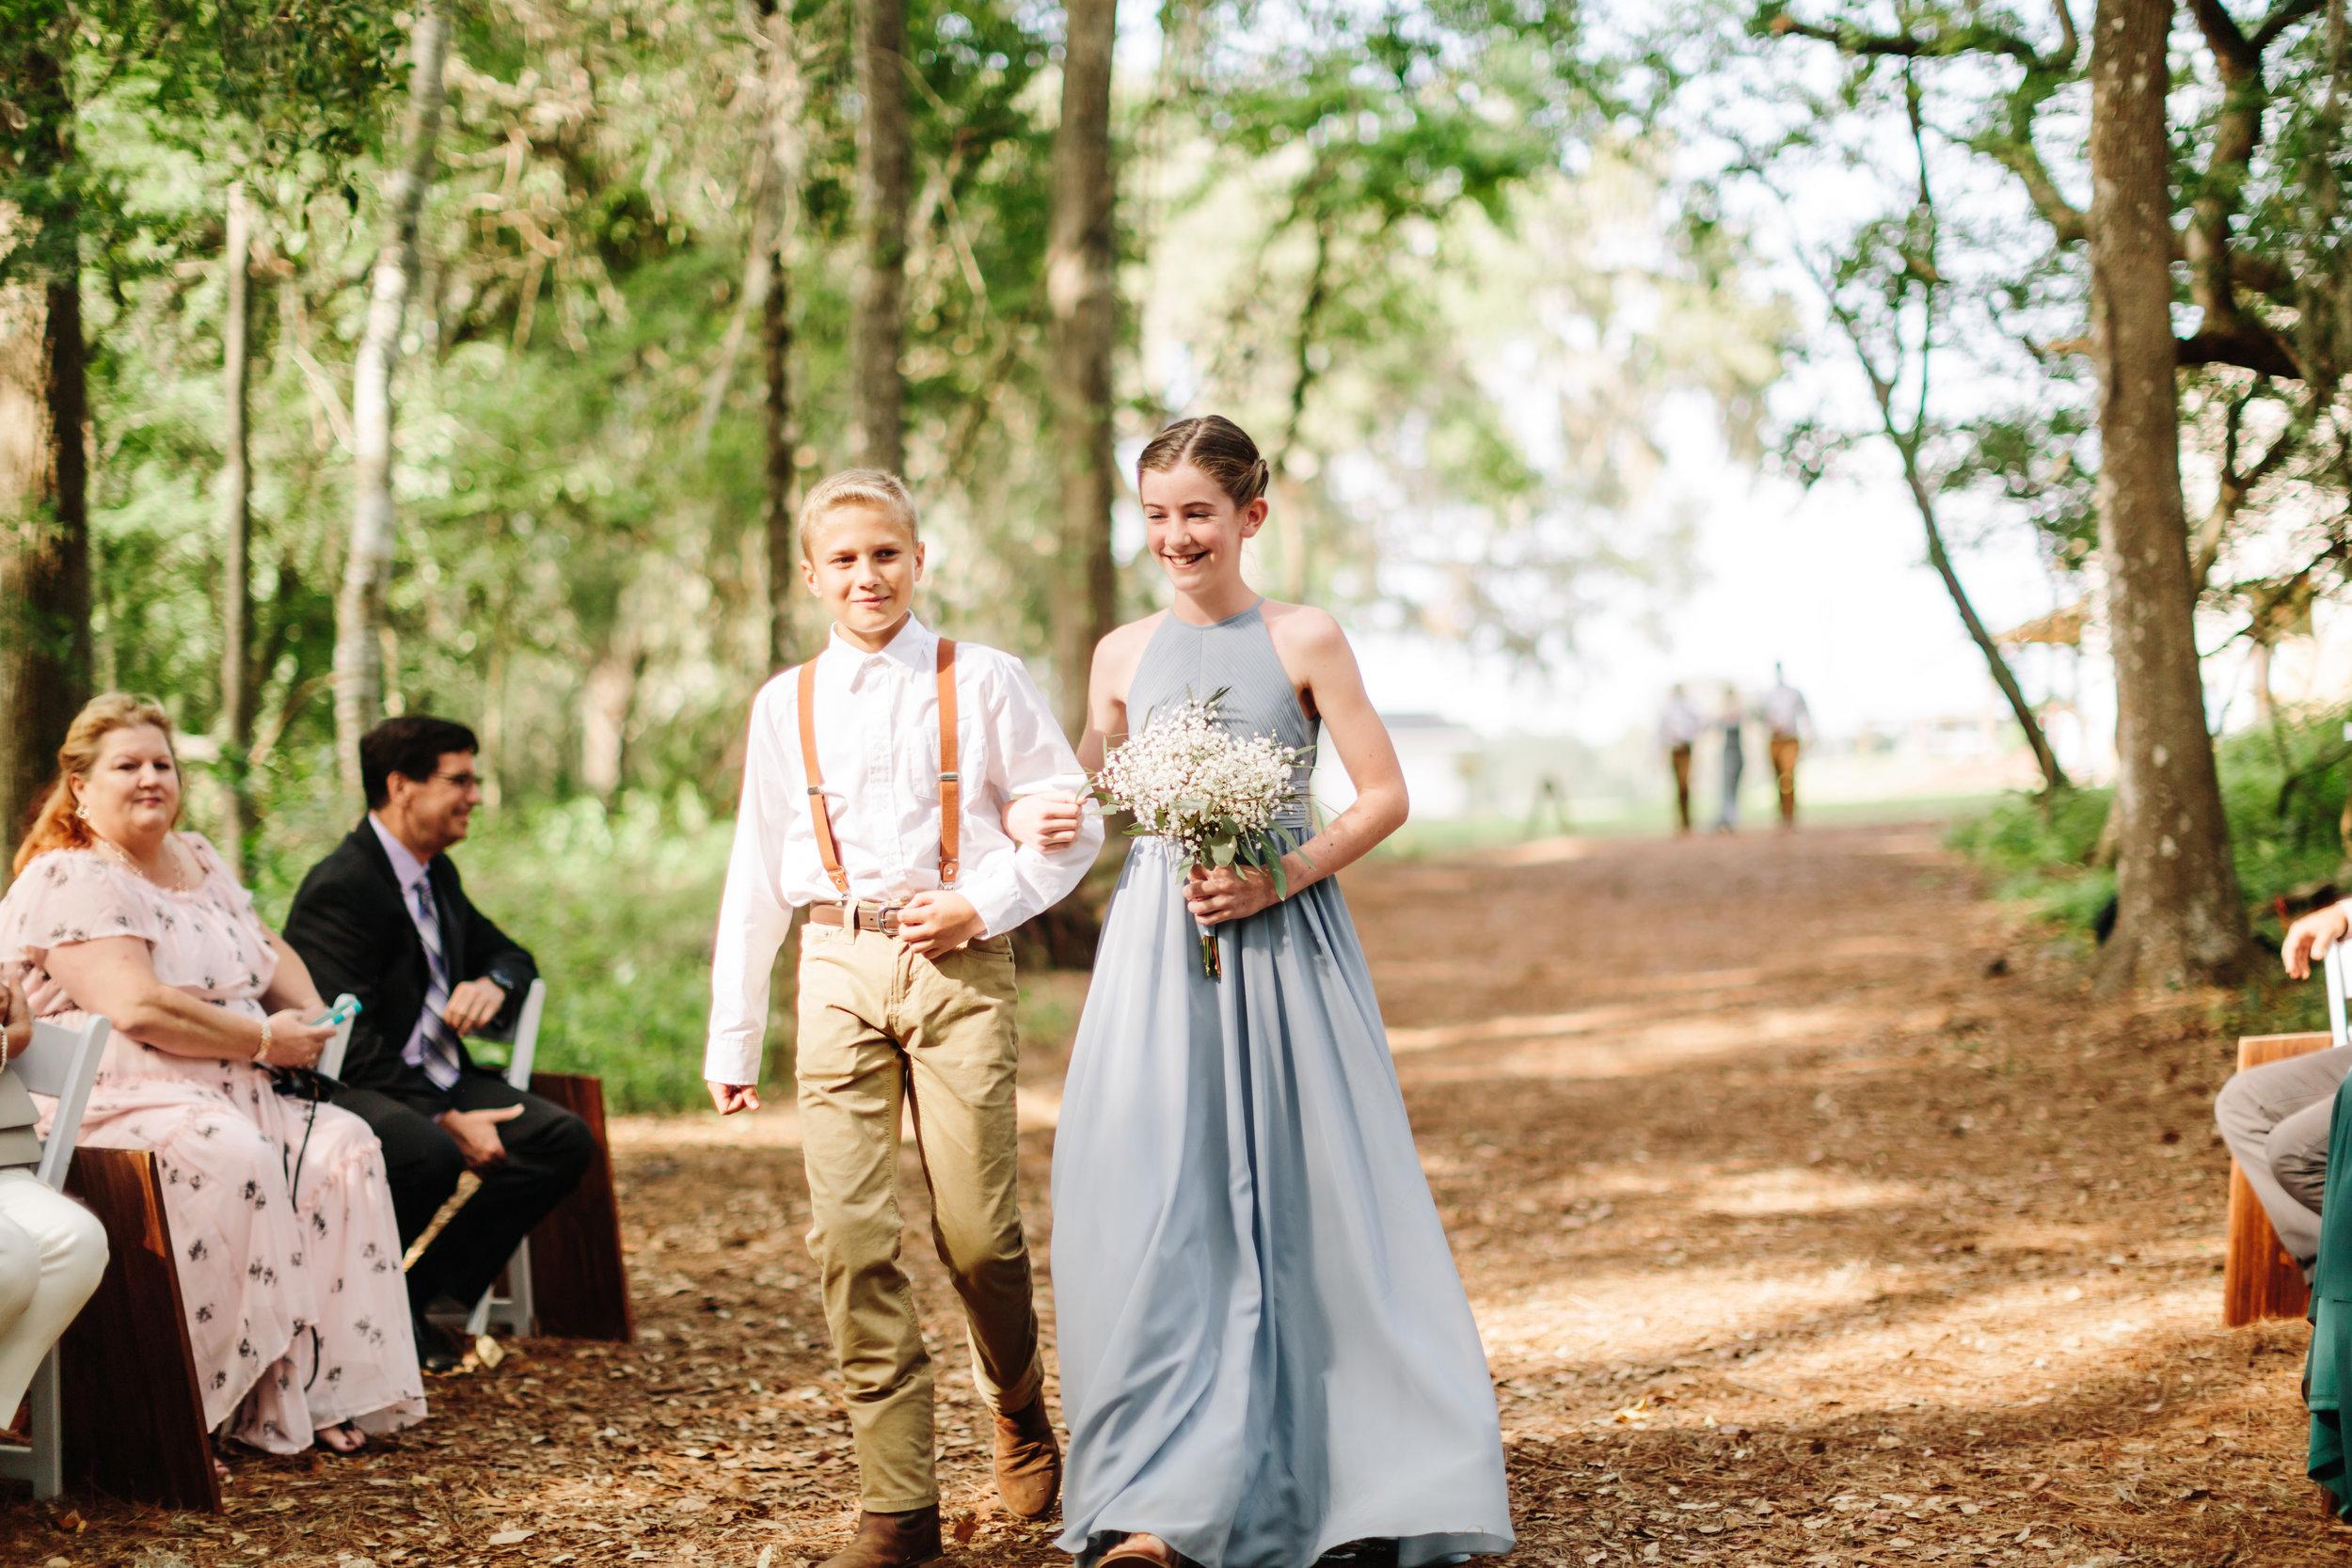 Griffin Wedding October Oaks Farm-270.jpg